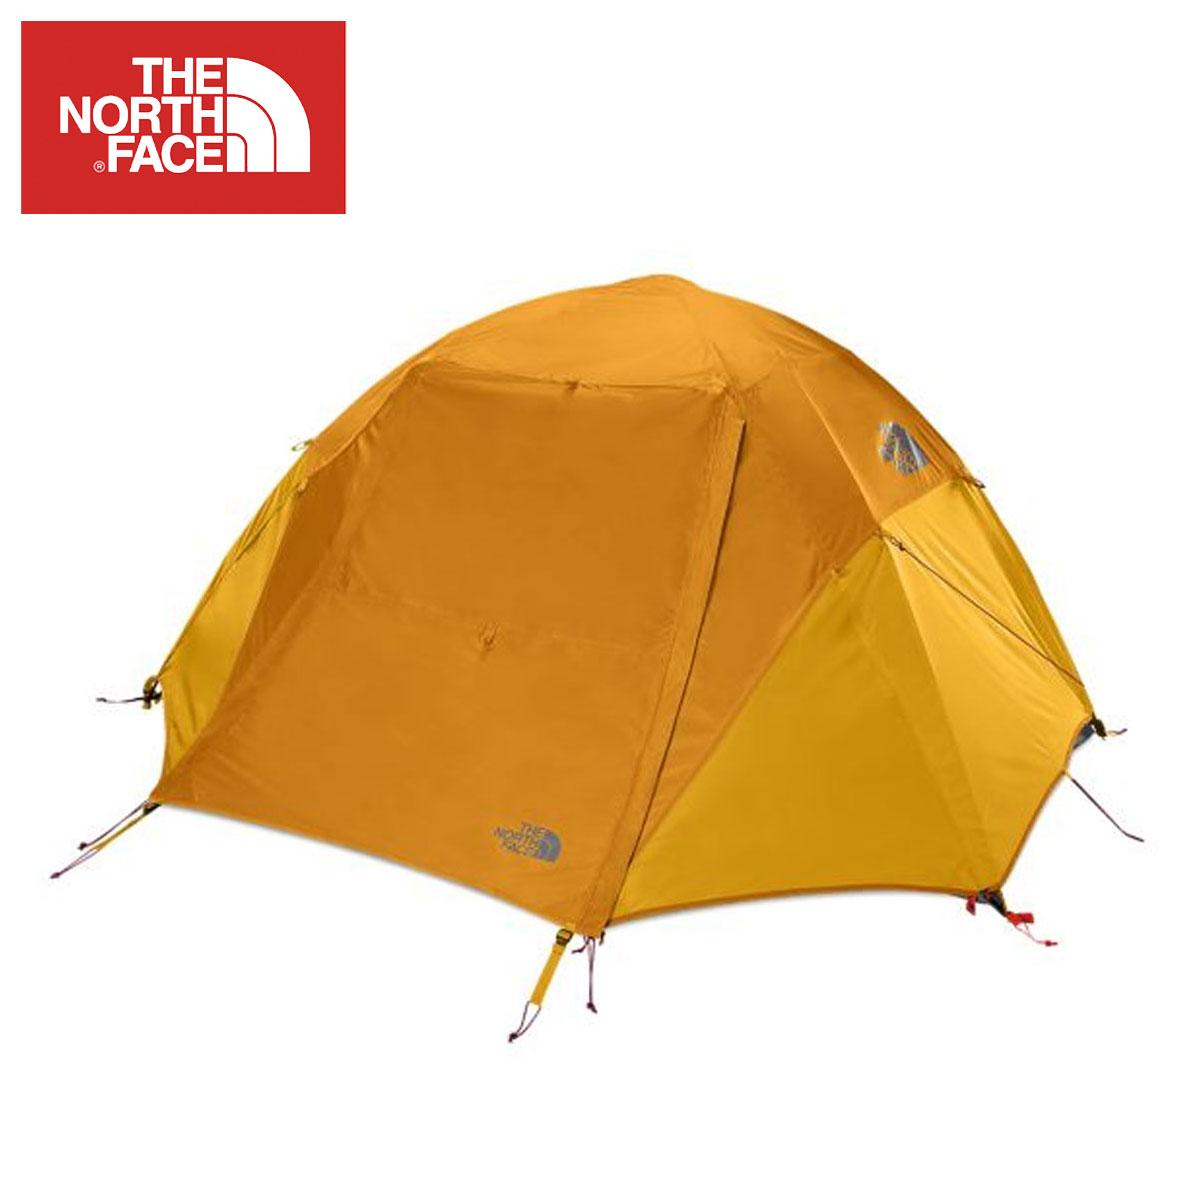 North Face THE NORTH FACE regular article dome type tent outdoor STORMBREAK 2 GOLDEN OAK/PAVEMENT  sc 1 st  Rakuten & Rakuten Ichiba shop MIXON: North Face THE NORTH FACE regular article ...